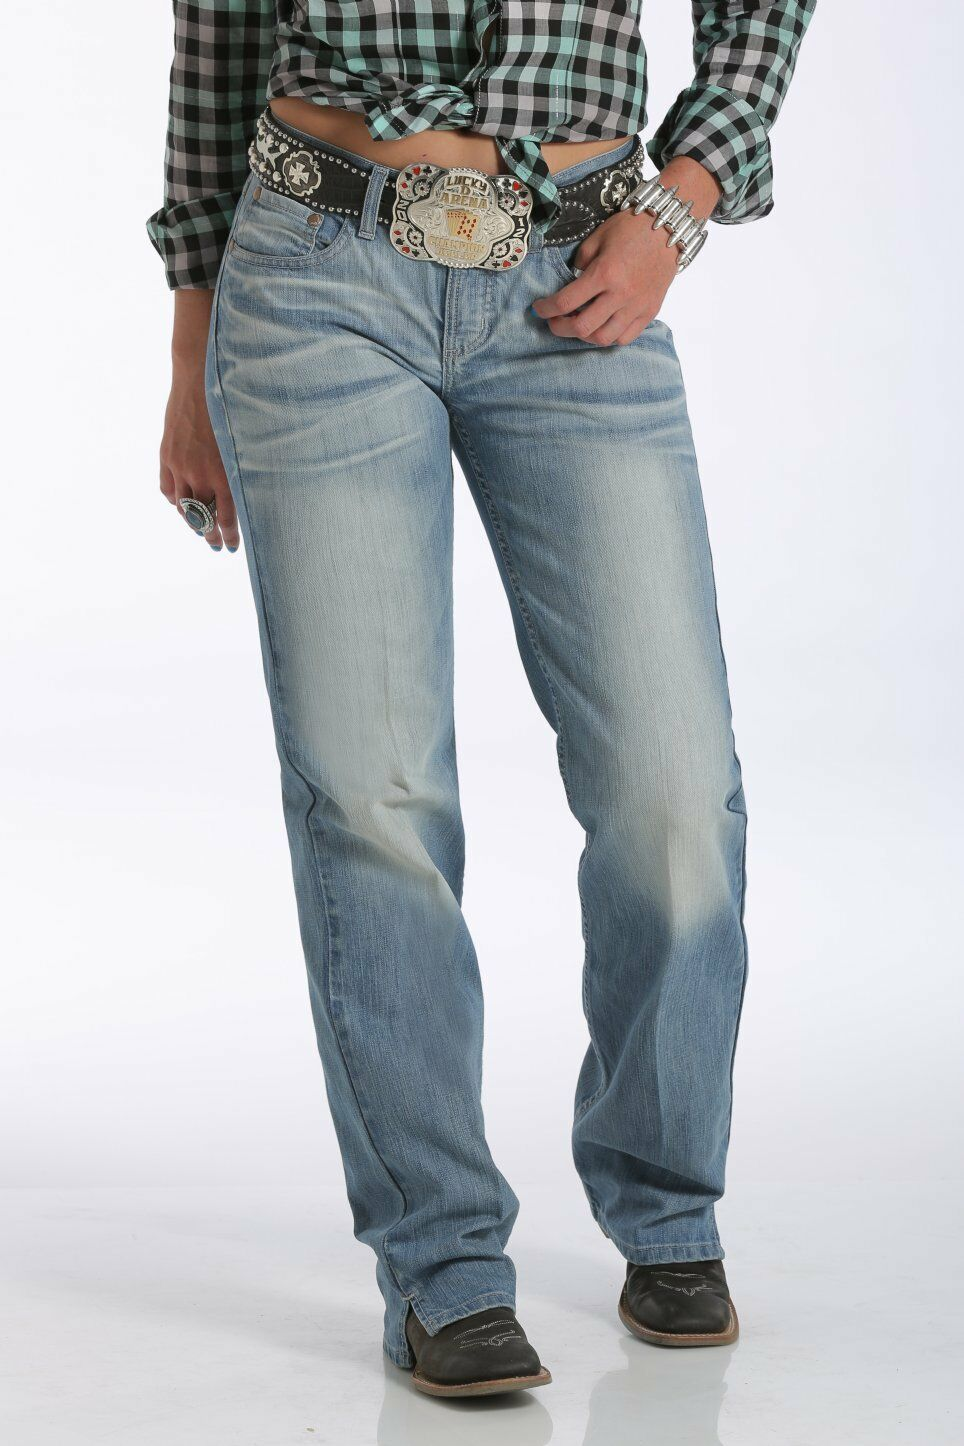 CRUEL GIRL Women's Georgia Relaxed Fit Mid Rise Boot Cut Jeans CB54752002 NWT